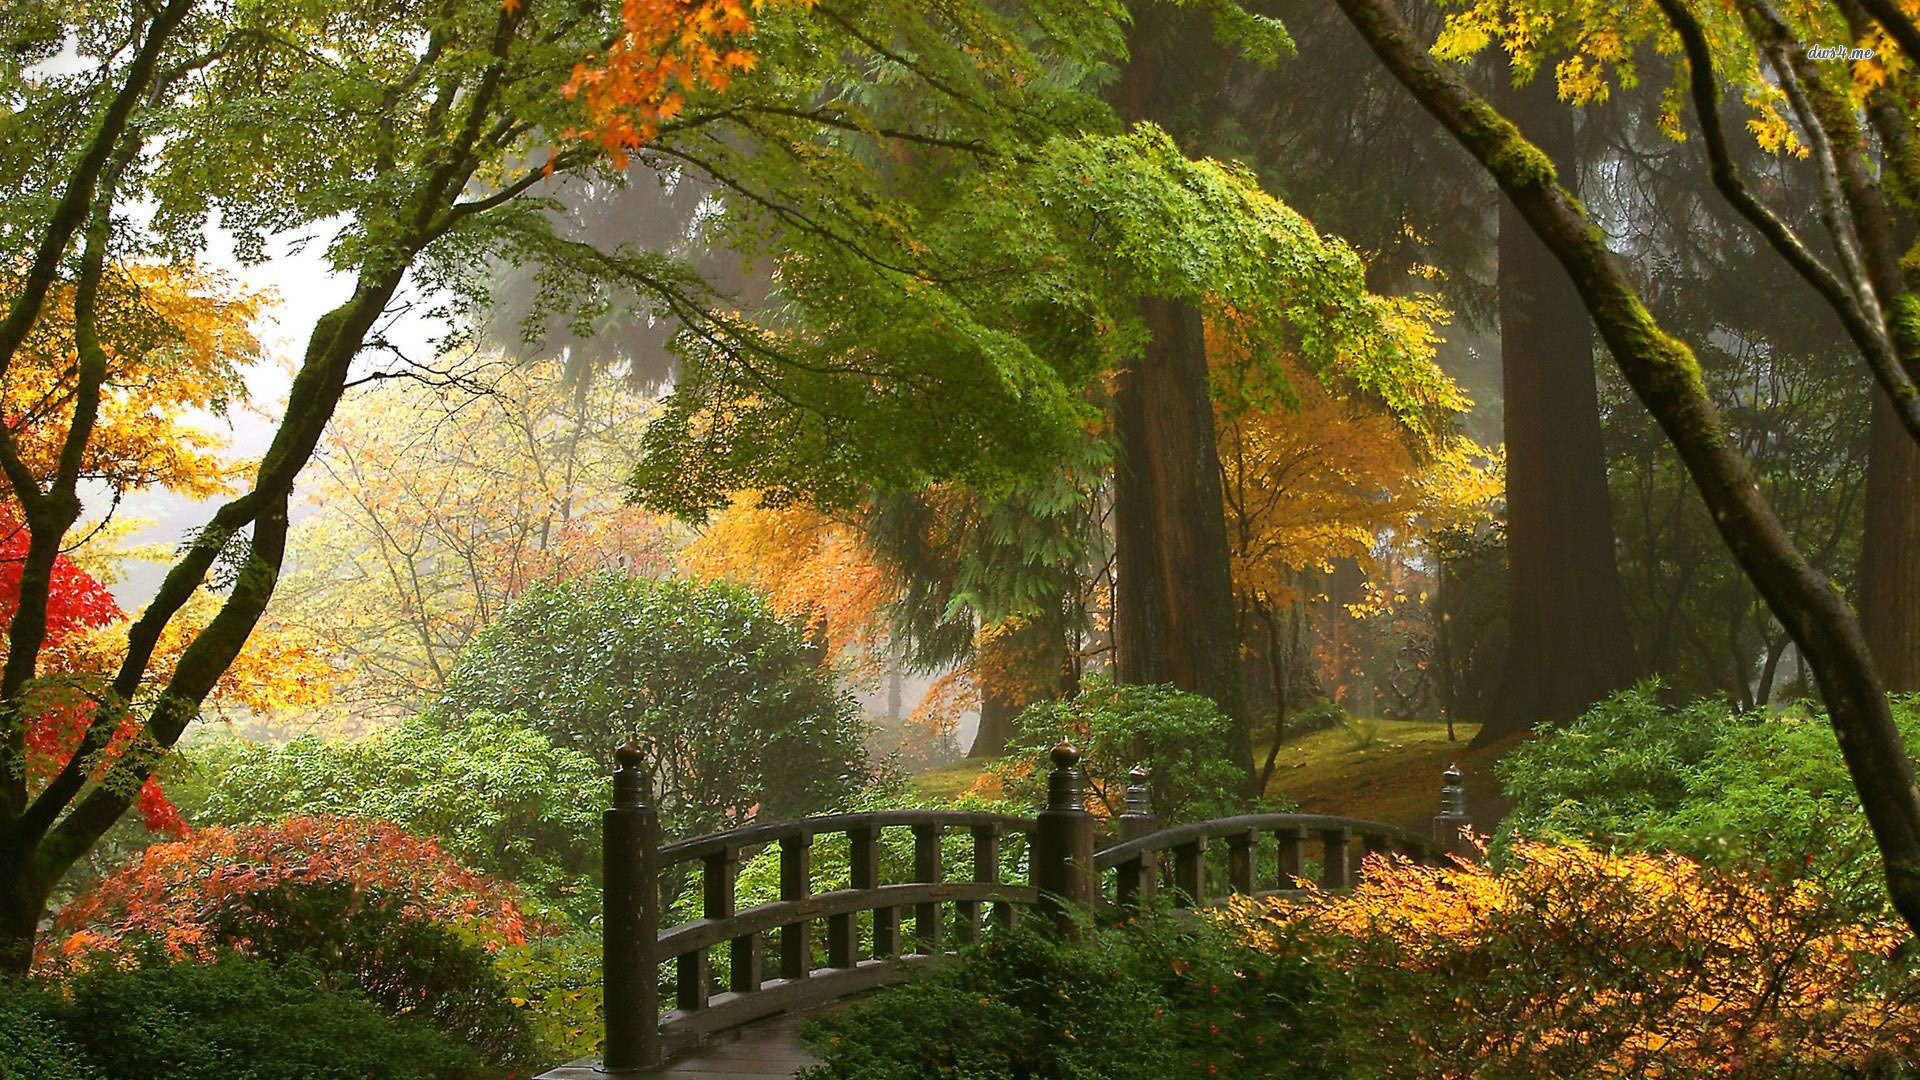 12484-japanese-garden-1920×1080-nature-wallpaper -AMB